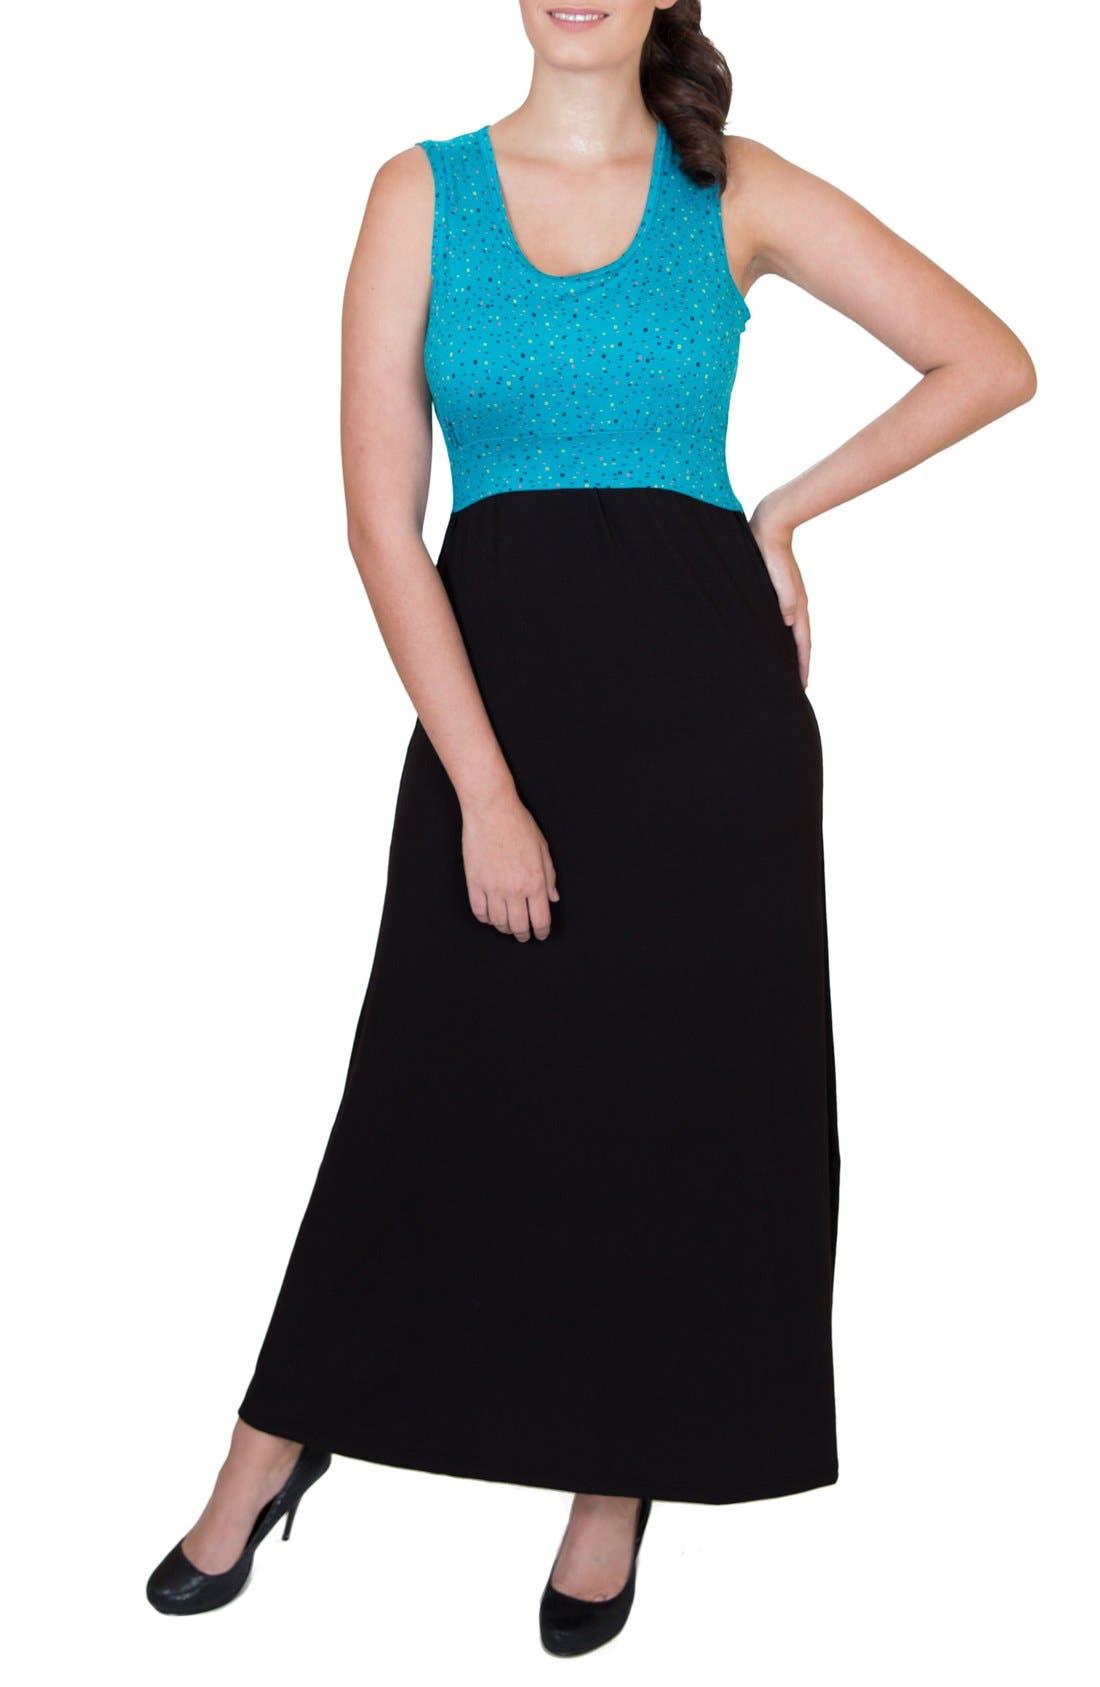 NURTURE-ELLE 'Mariana' Maternity/Nursing Maxi Dress